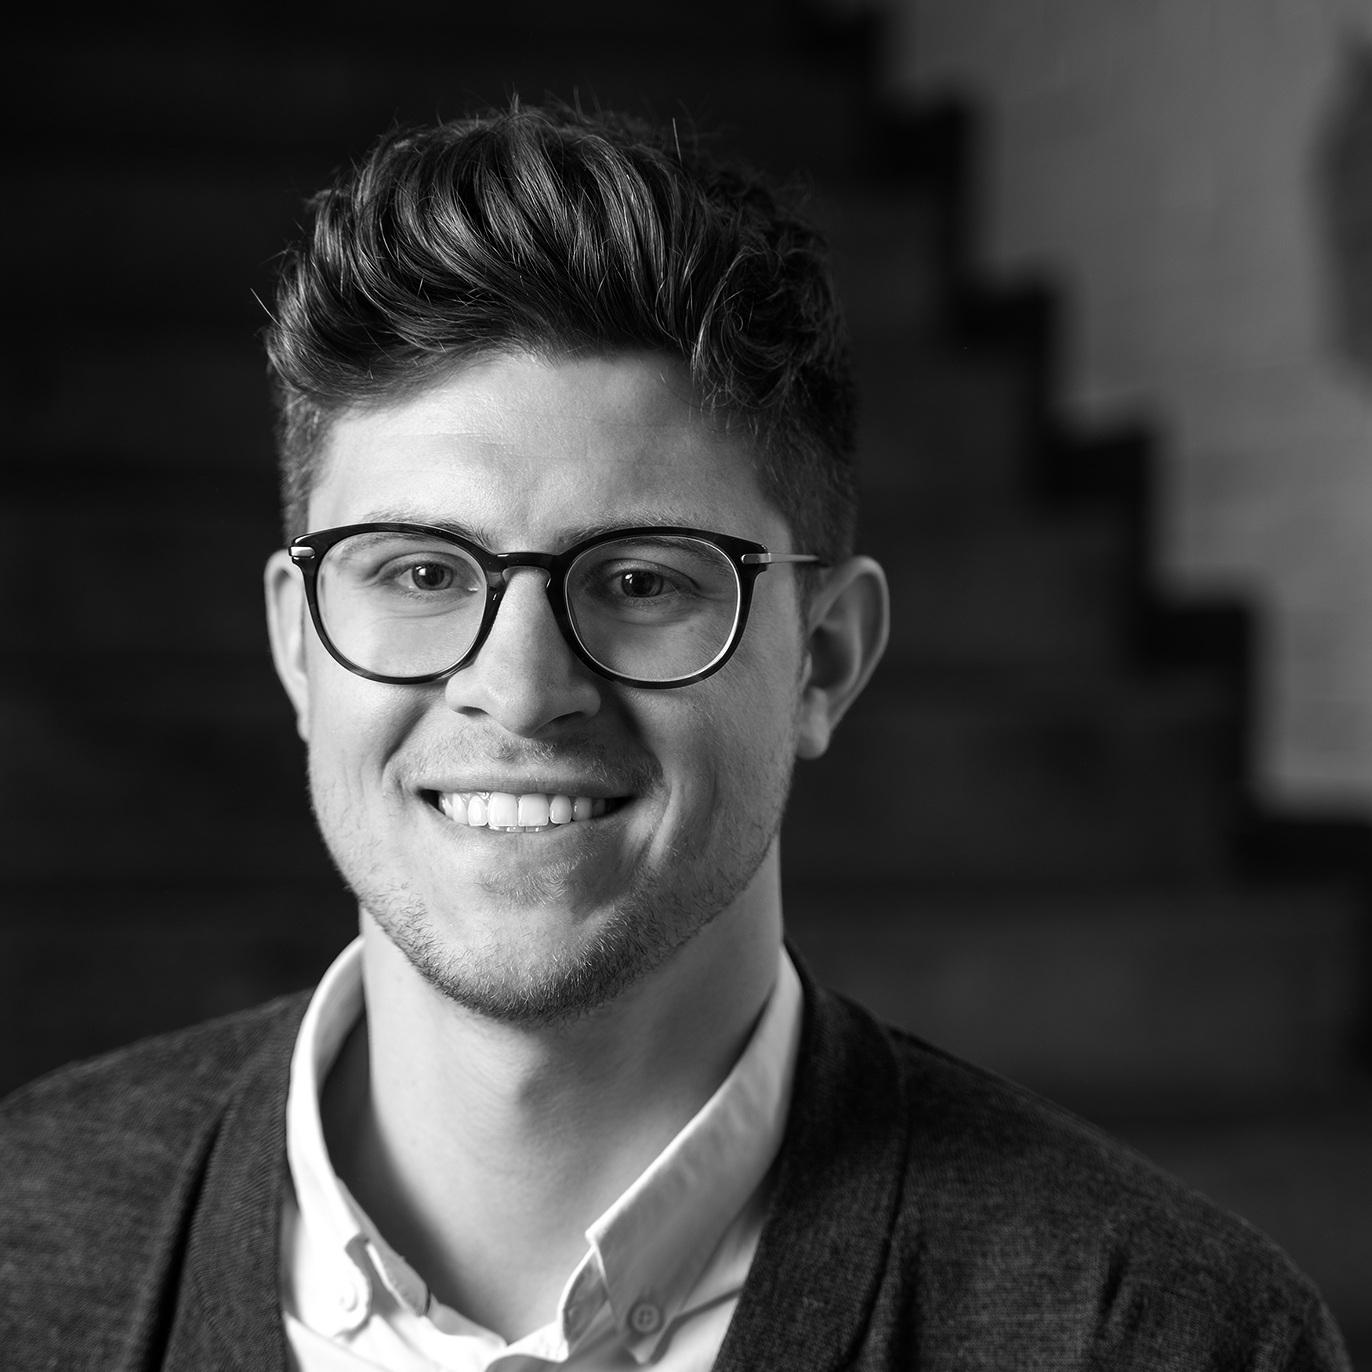 Julian Wagner - Innovation Adoption, Digital Human Interaction & User Experience